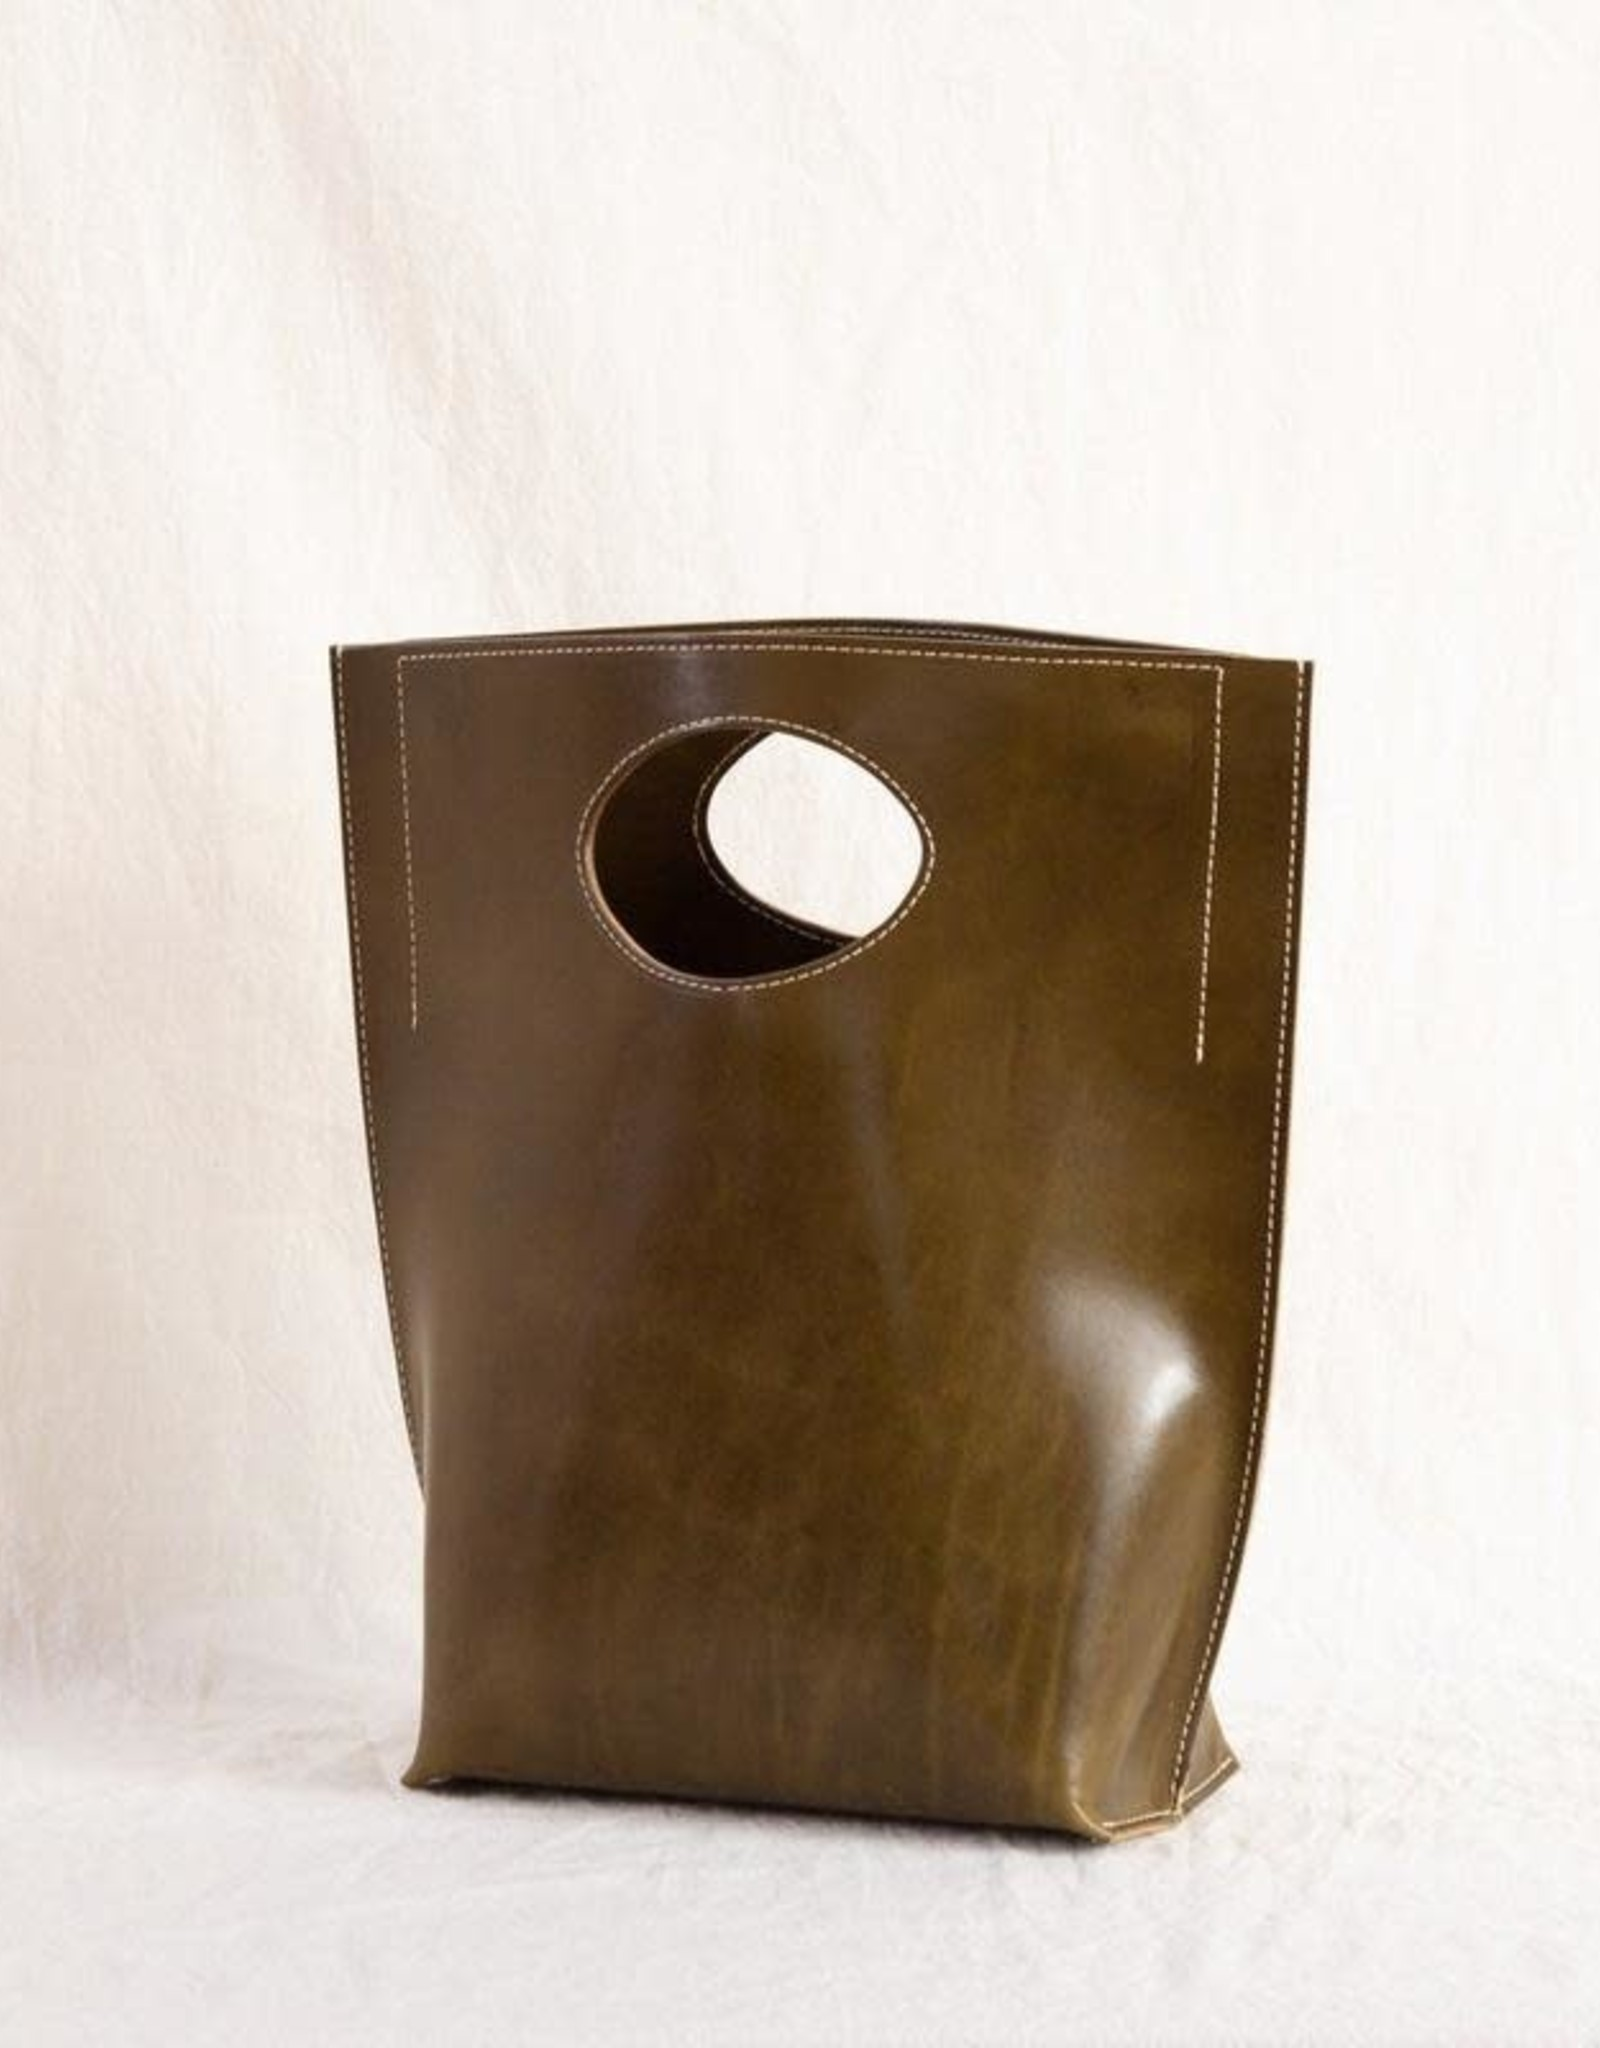 PENNYROYAL Lunch Pail Bag